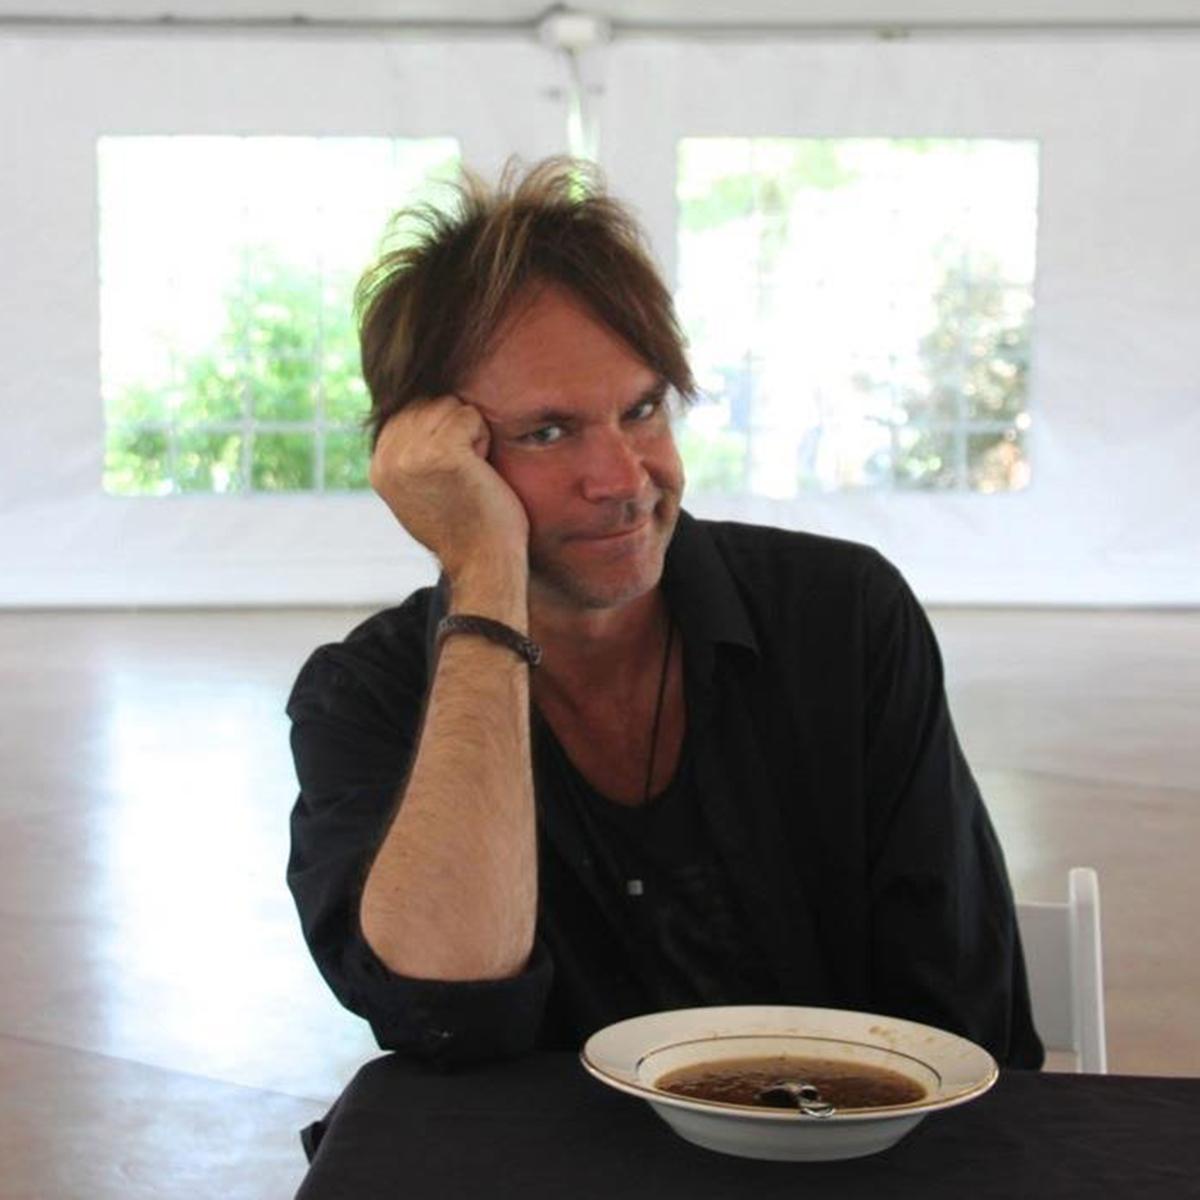 Craig bartock eating soup tawt